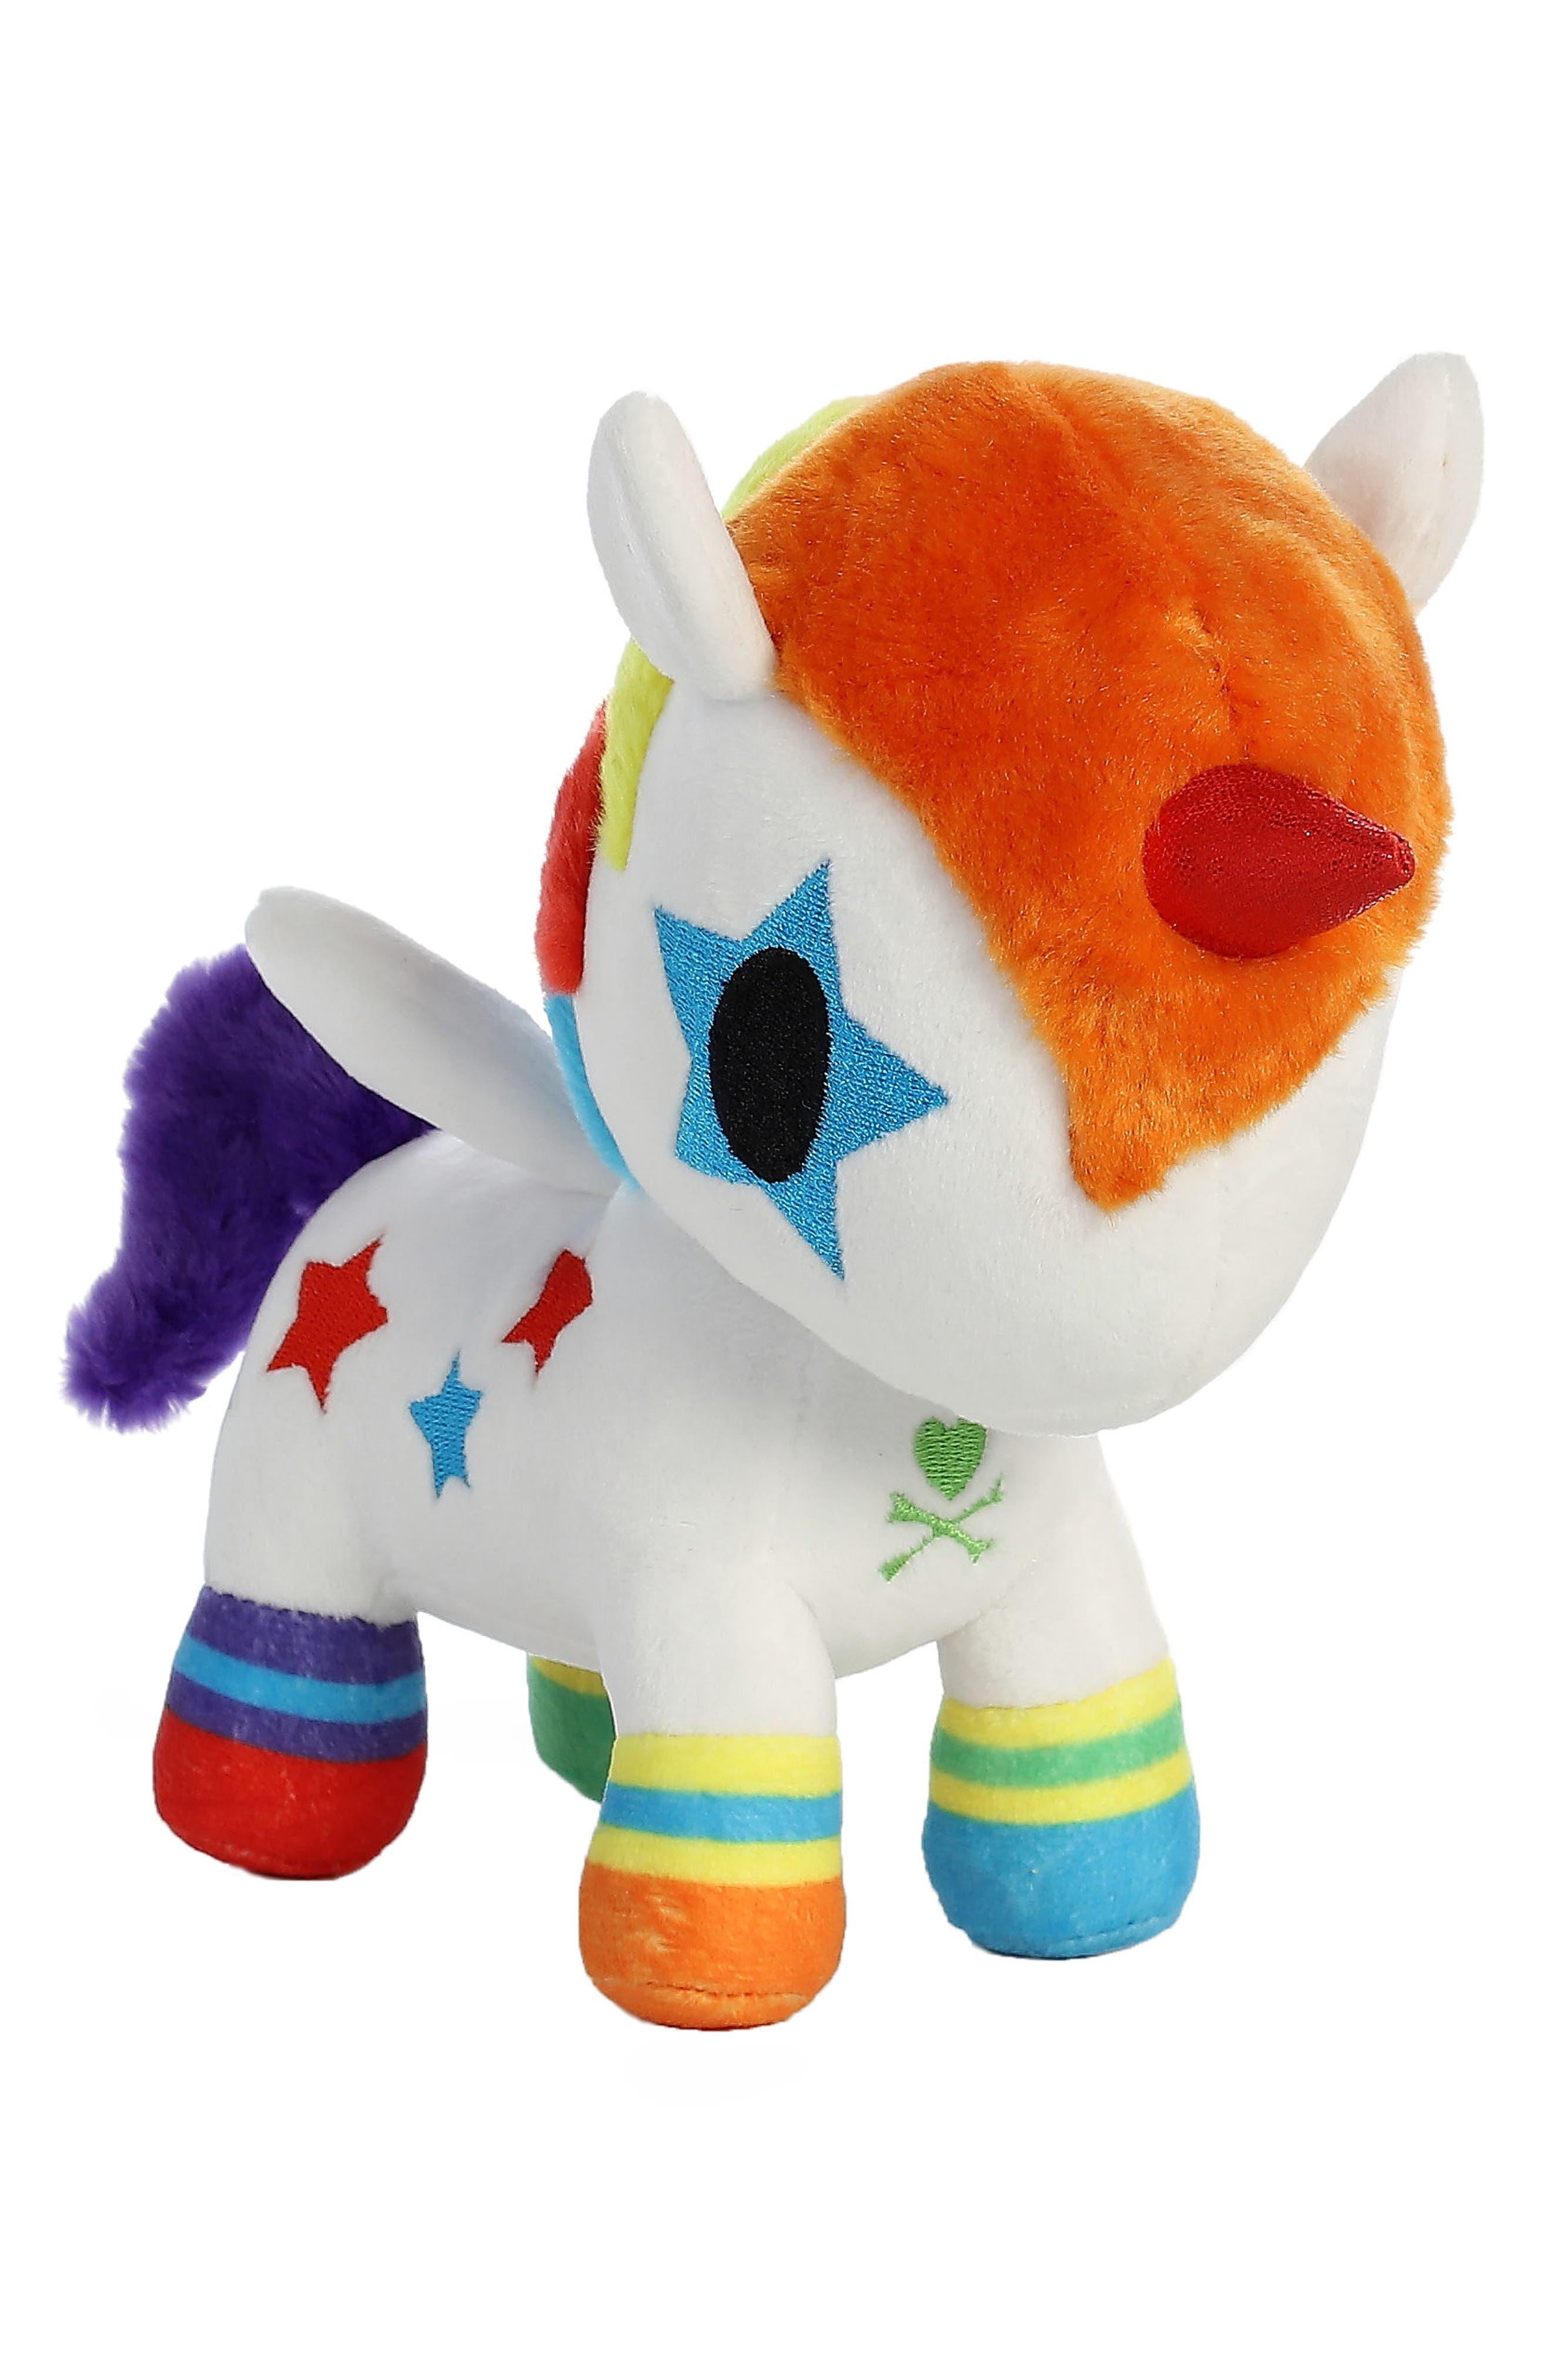 x tokidoki Bowie Unicorno Stuffed Animal,                             Main thumbnail 1, color,